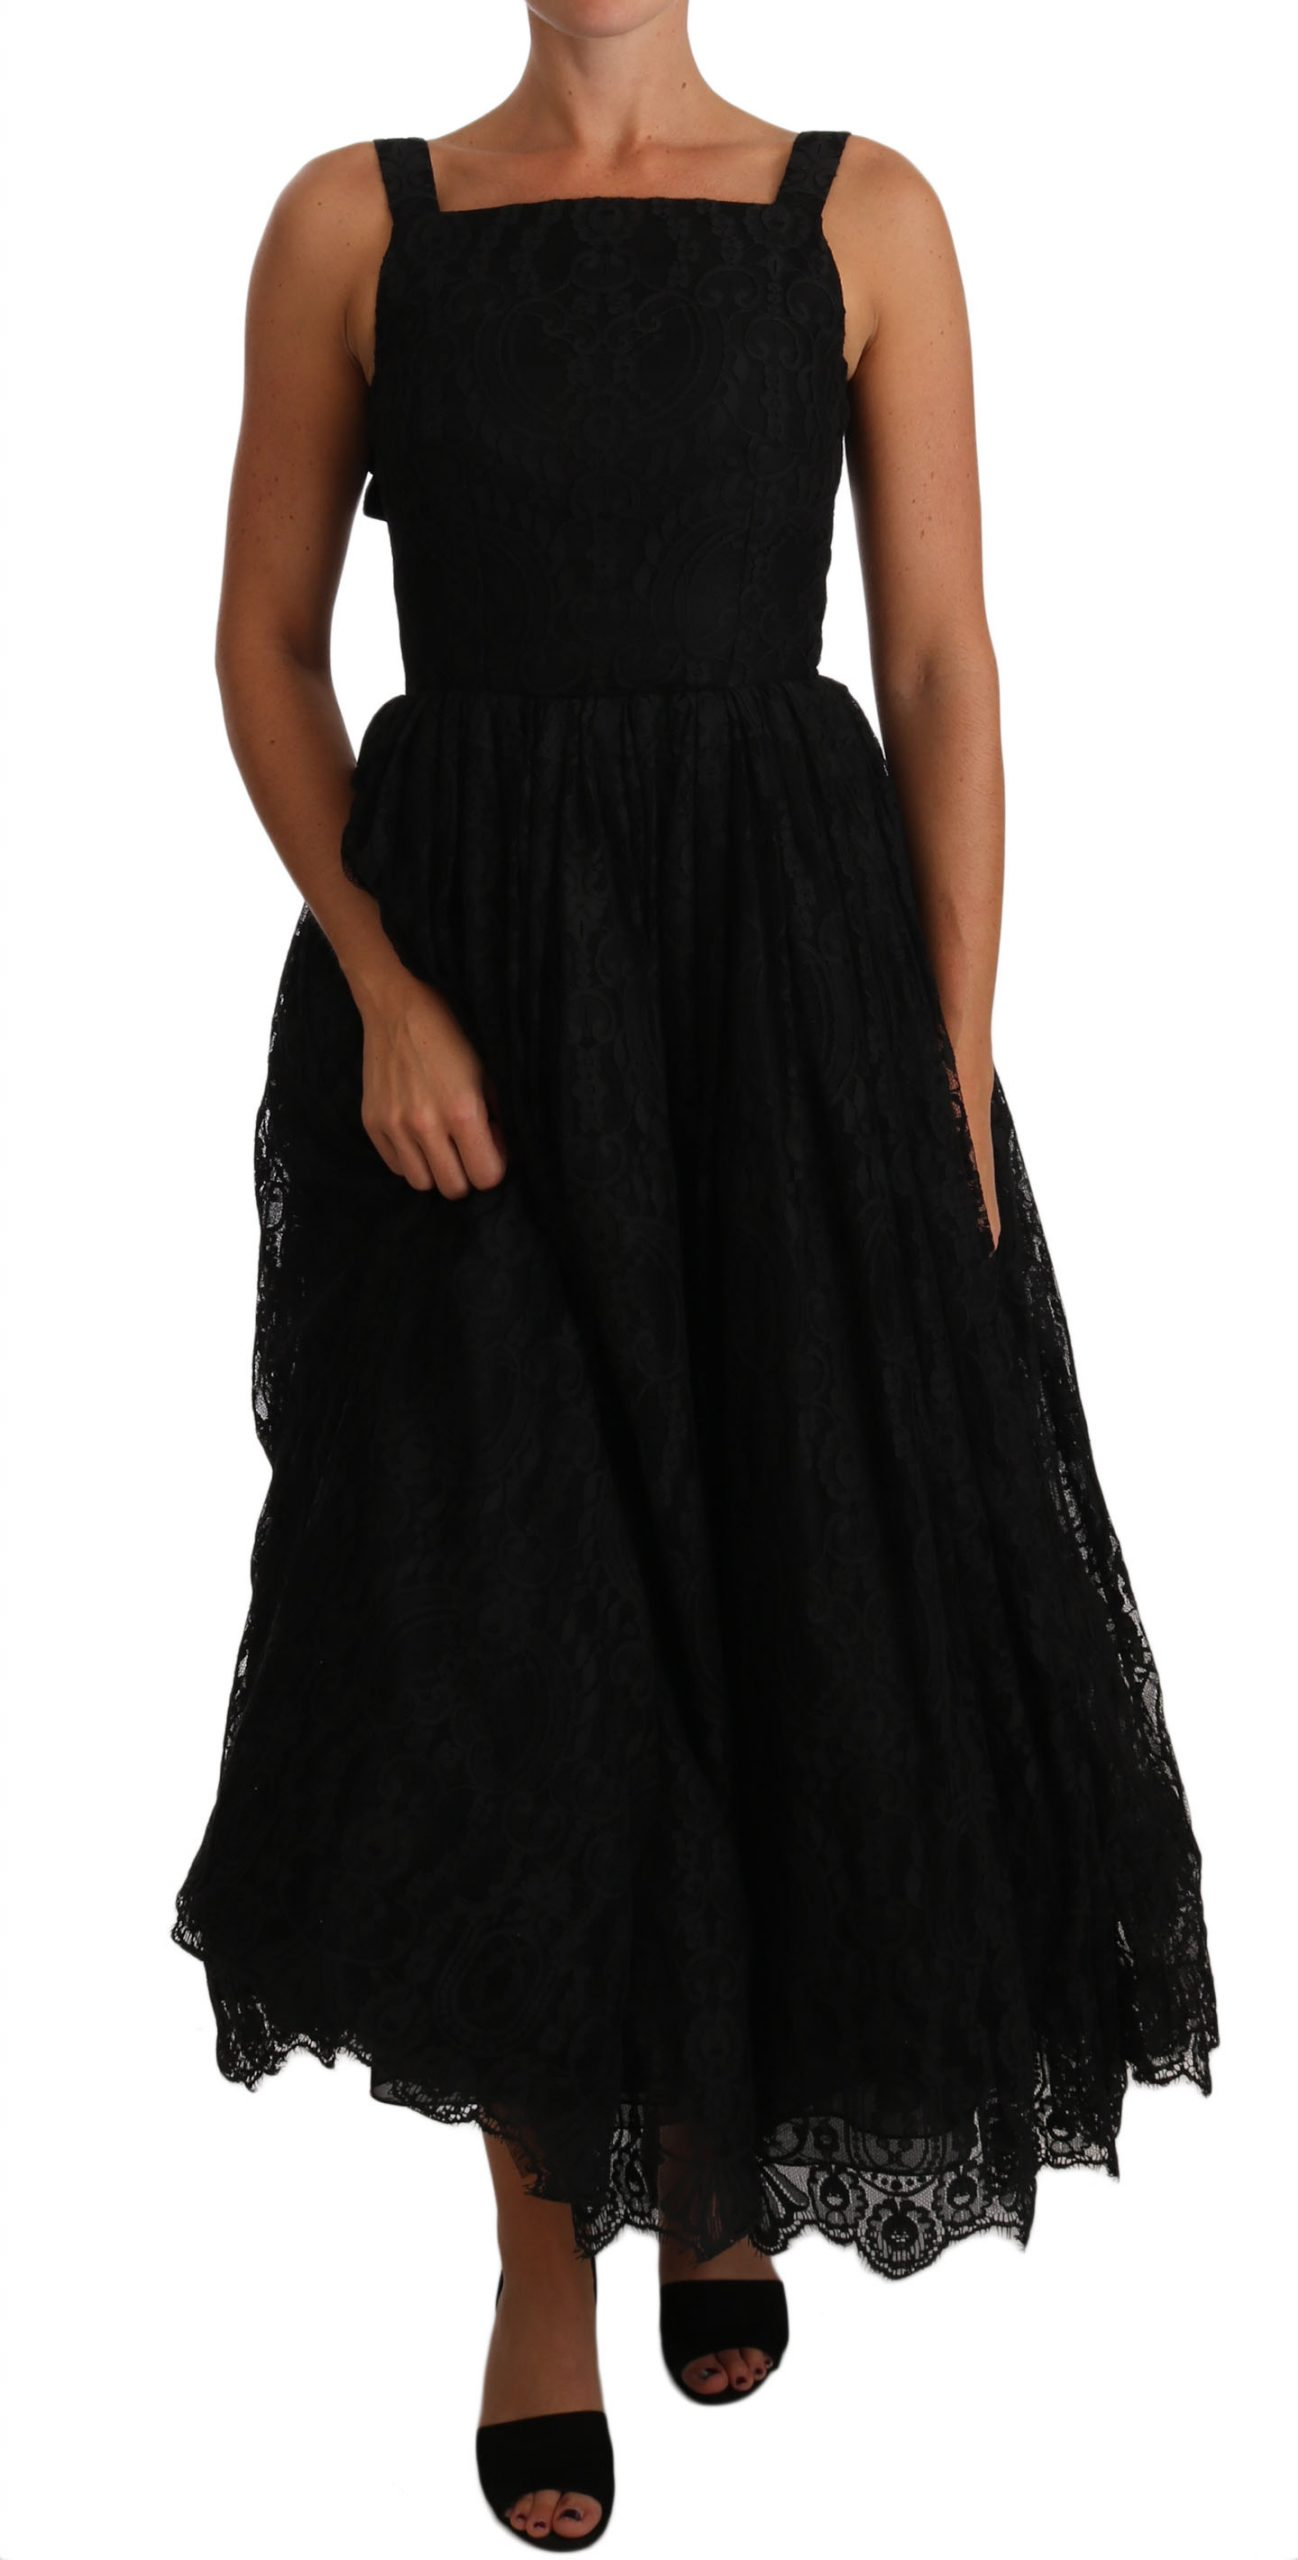 Dolce & Gabbana Women's Lace Floral Ruffle Bows Dress Black DR1429 - IT38|XS